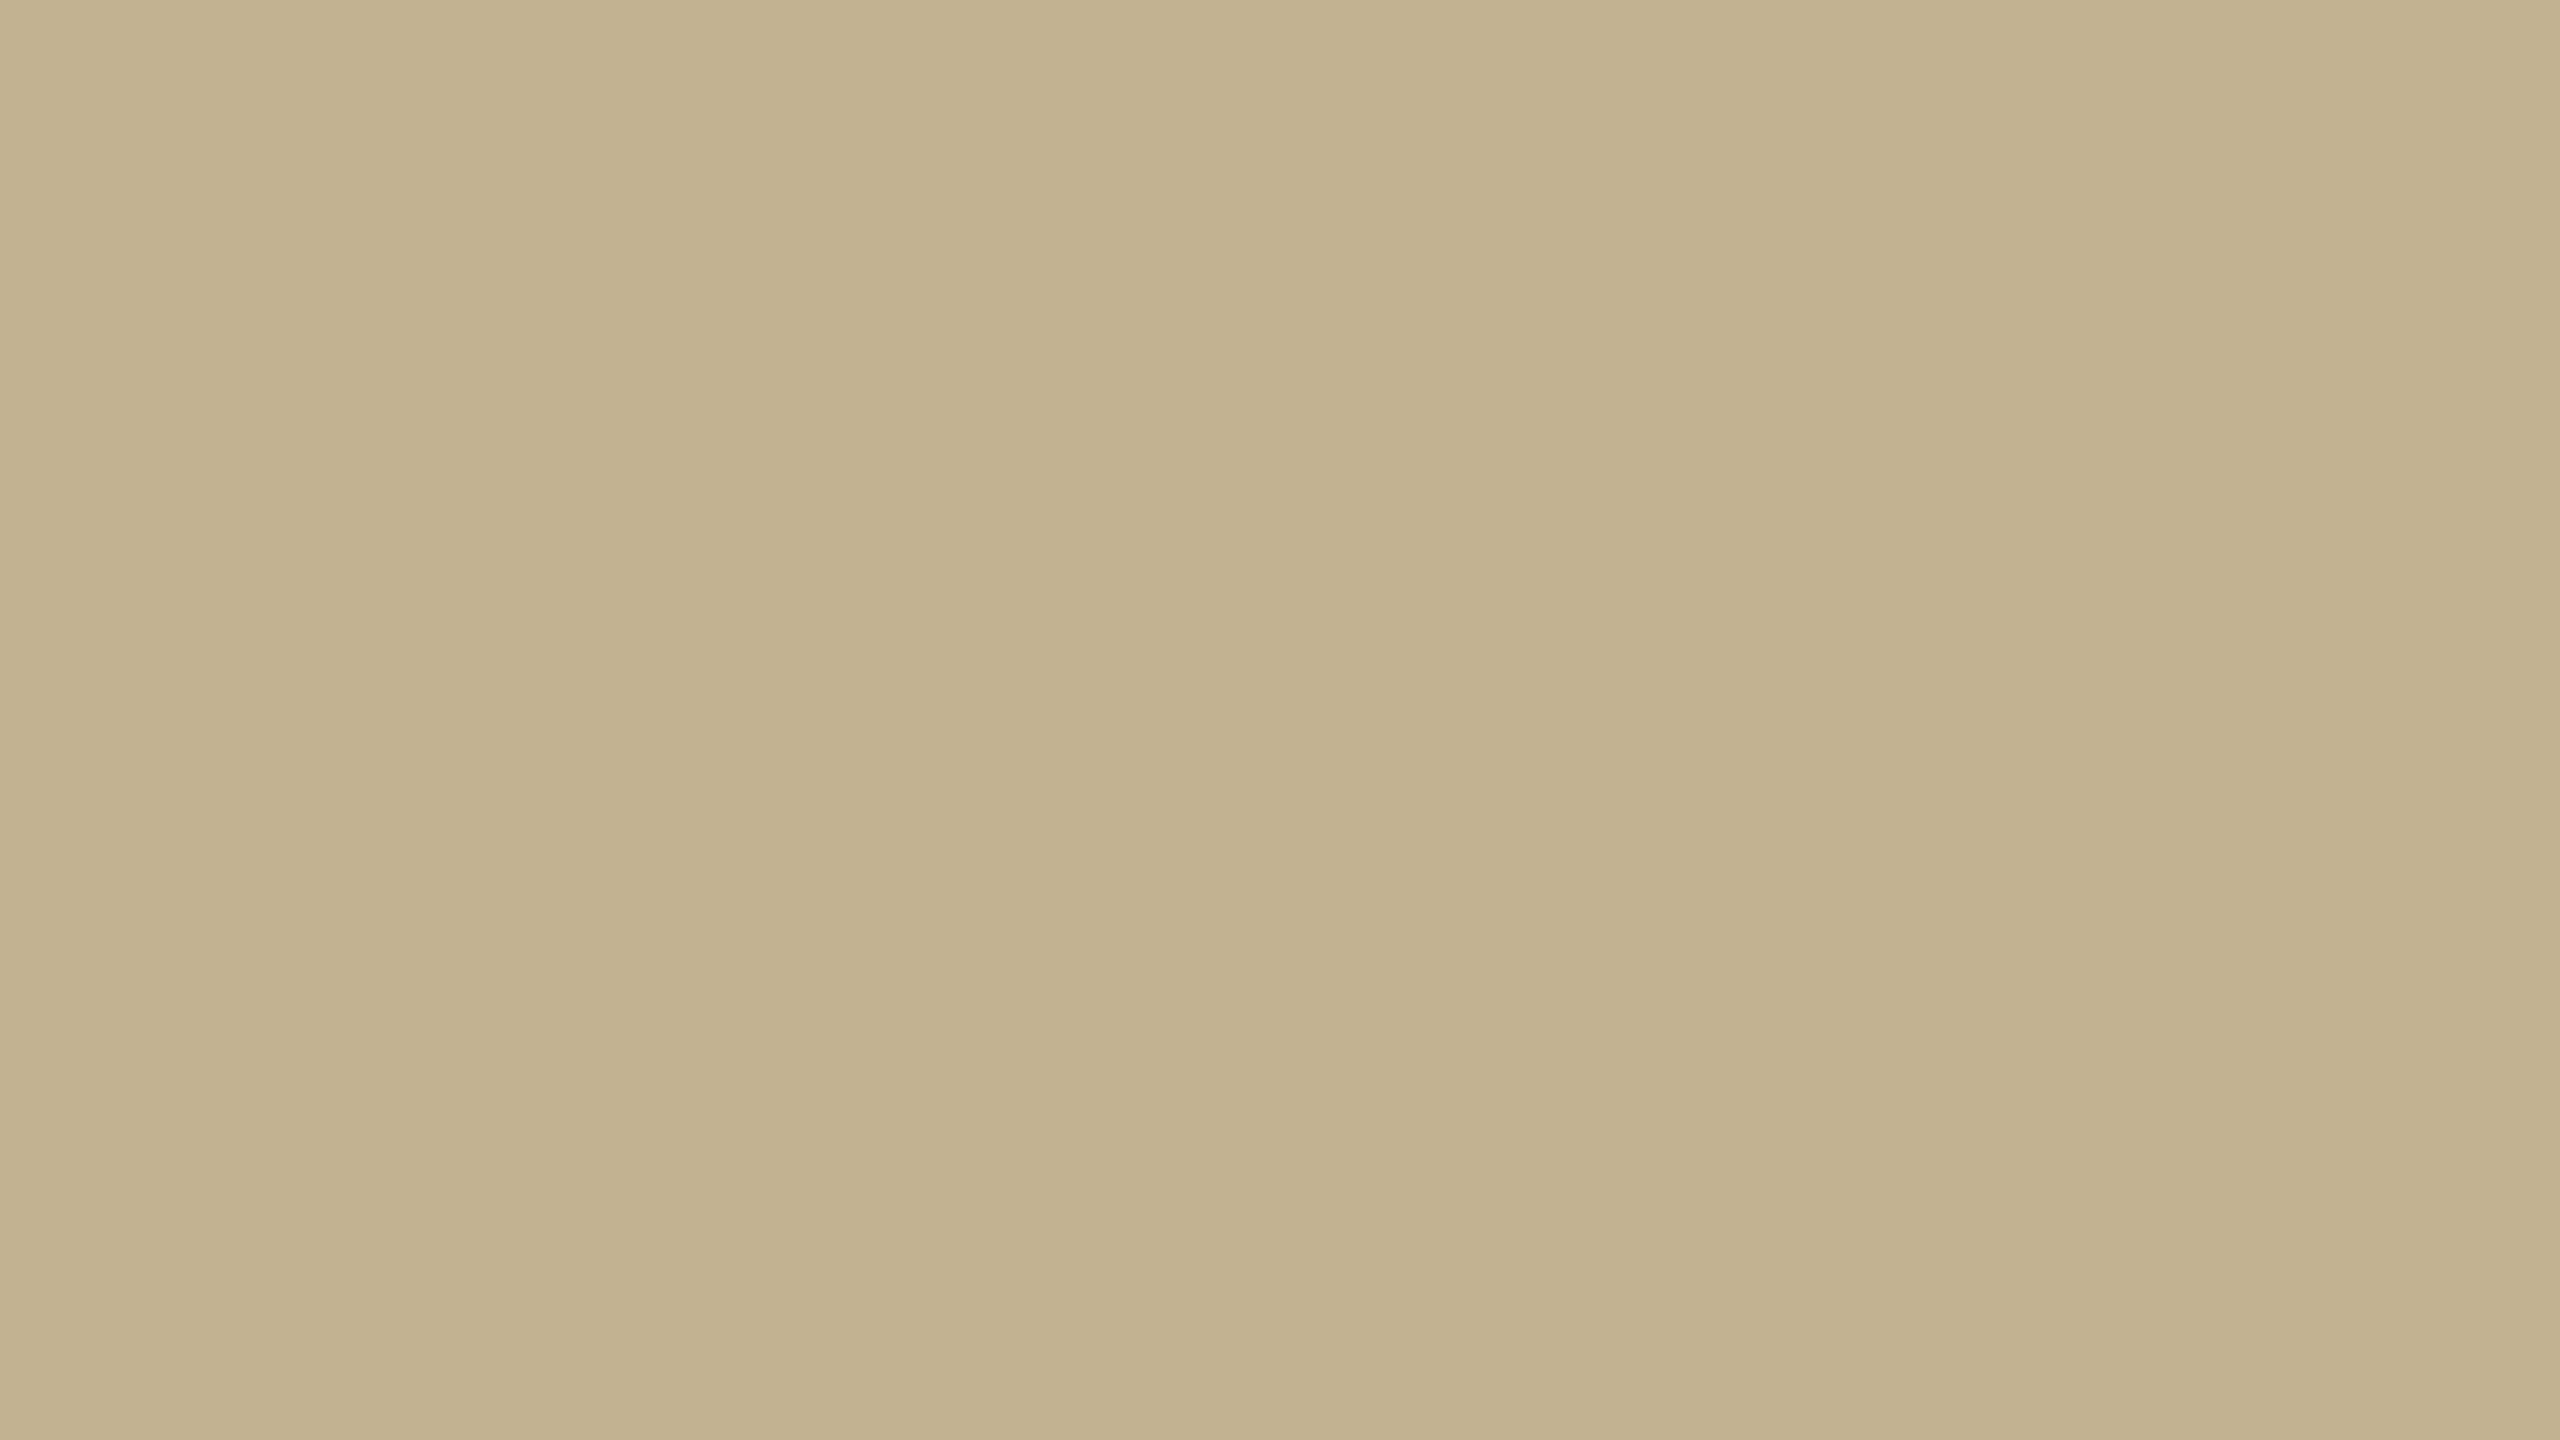 2560x1440 Khaki Web Solid Color Background